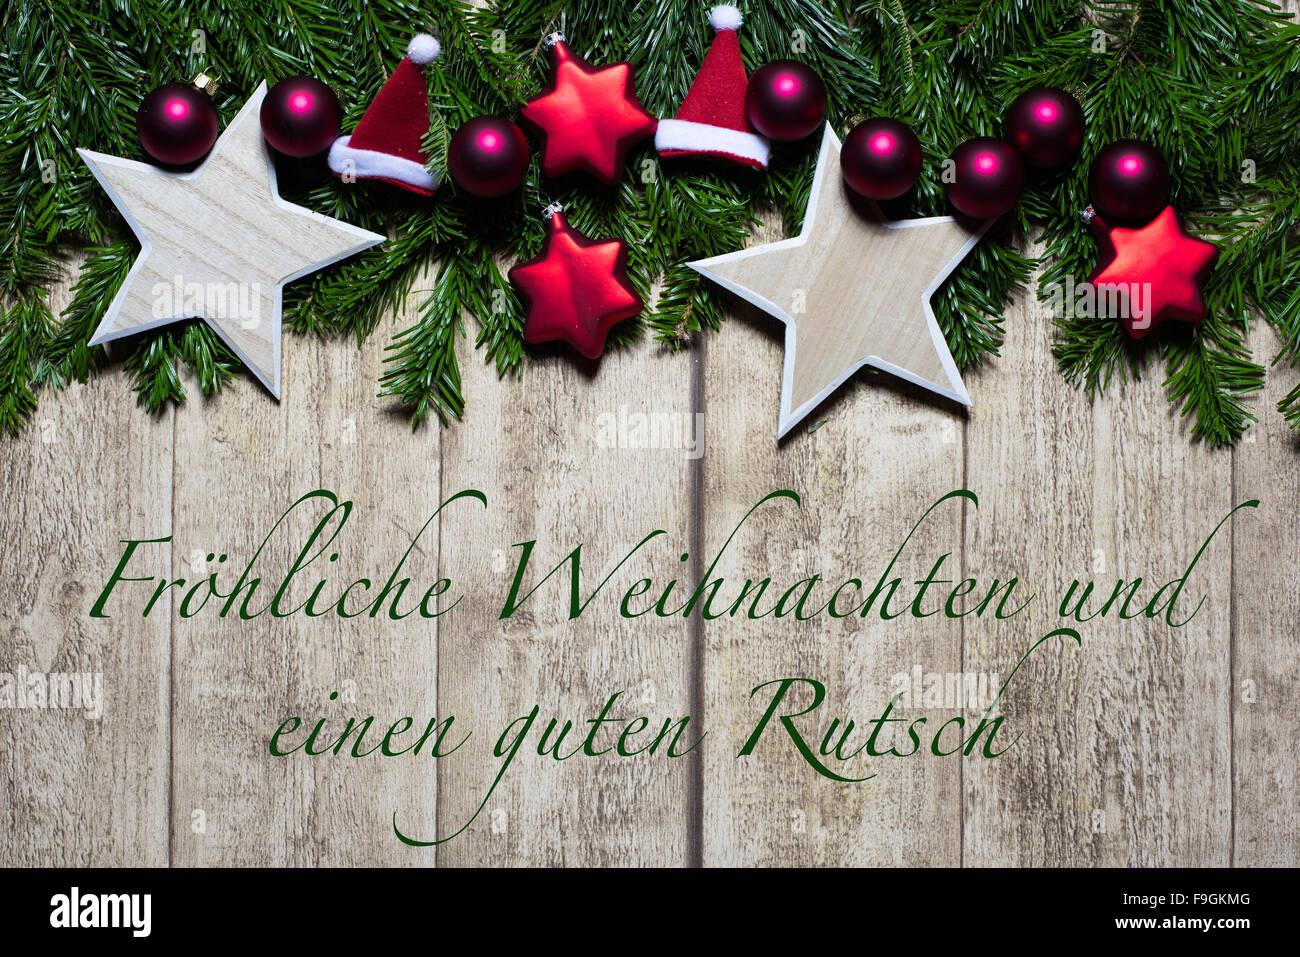 Weihnachtskarte Stock Photo